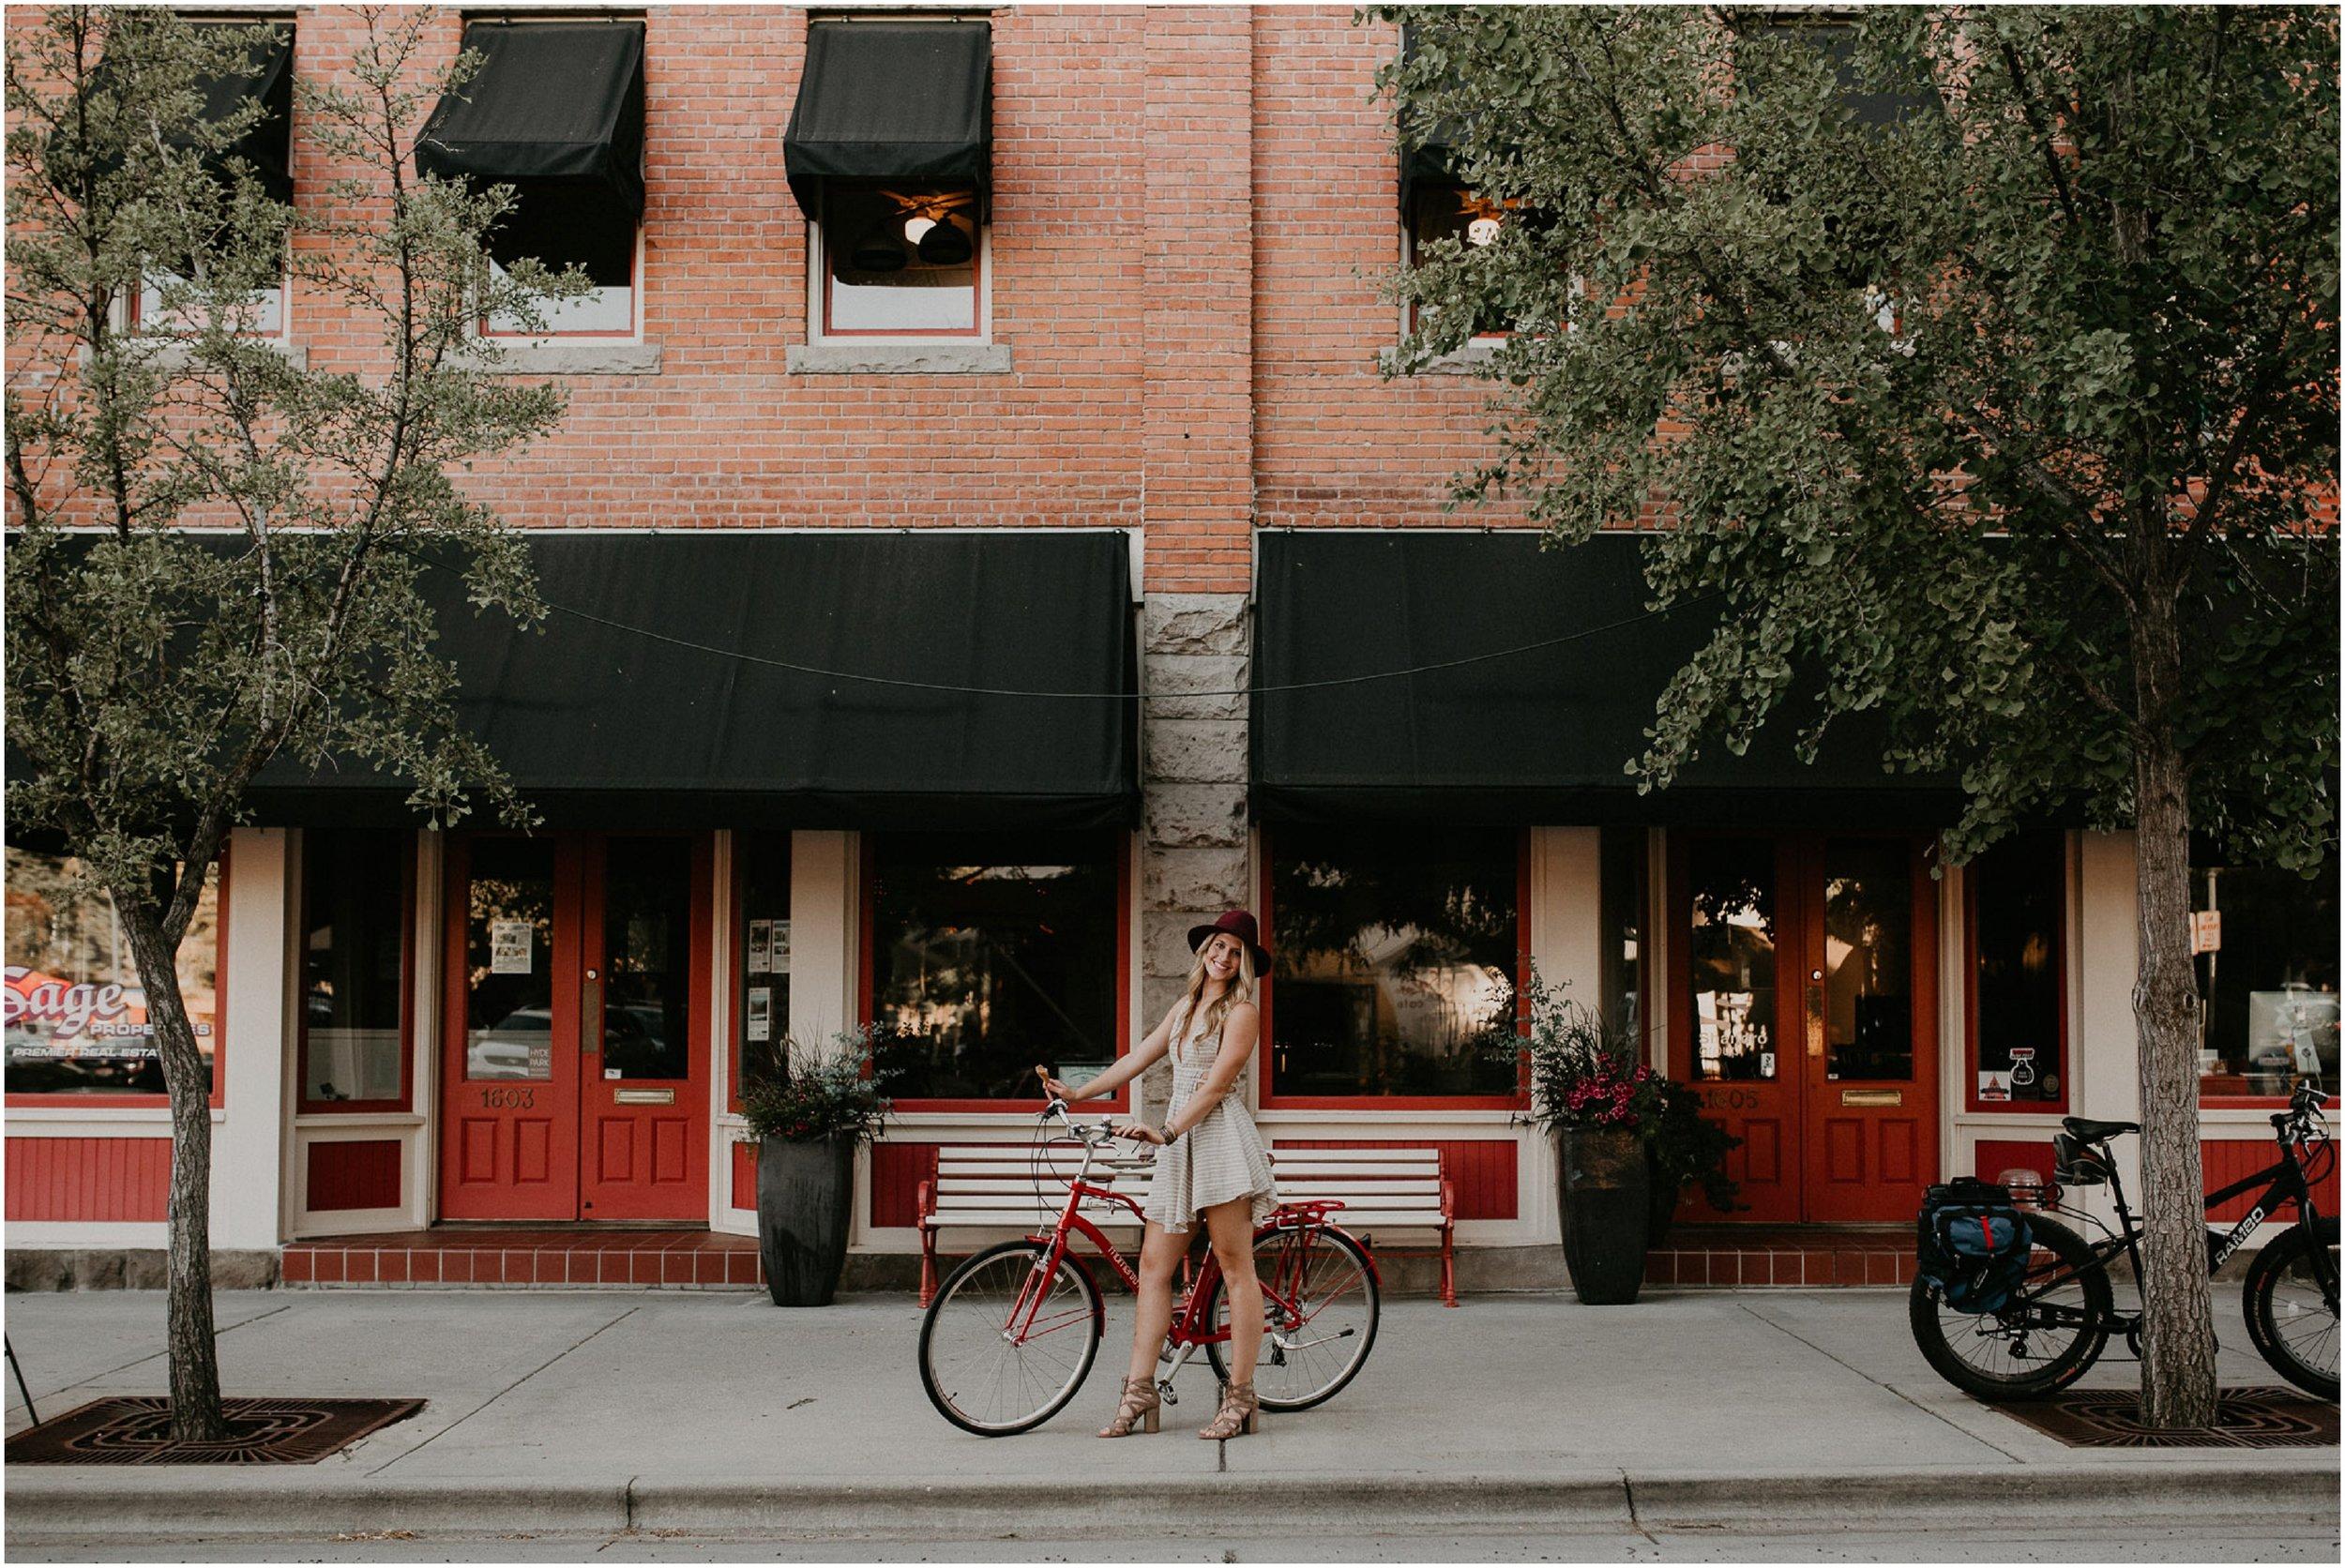 Boise Senior Photographer Makayla Madden Photography Styling Boho Downtown Idaho Table Rock Swank Boutique Creative Senior Picture Ideas Inspiration Hyde Park Bike Dresses Hour Raw Real Unique